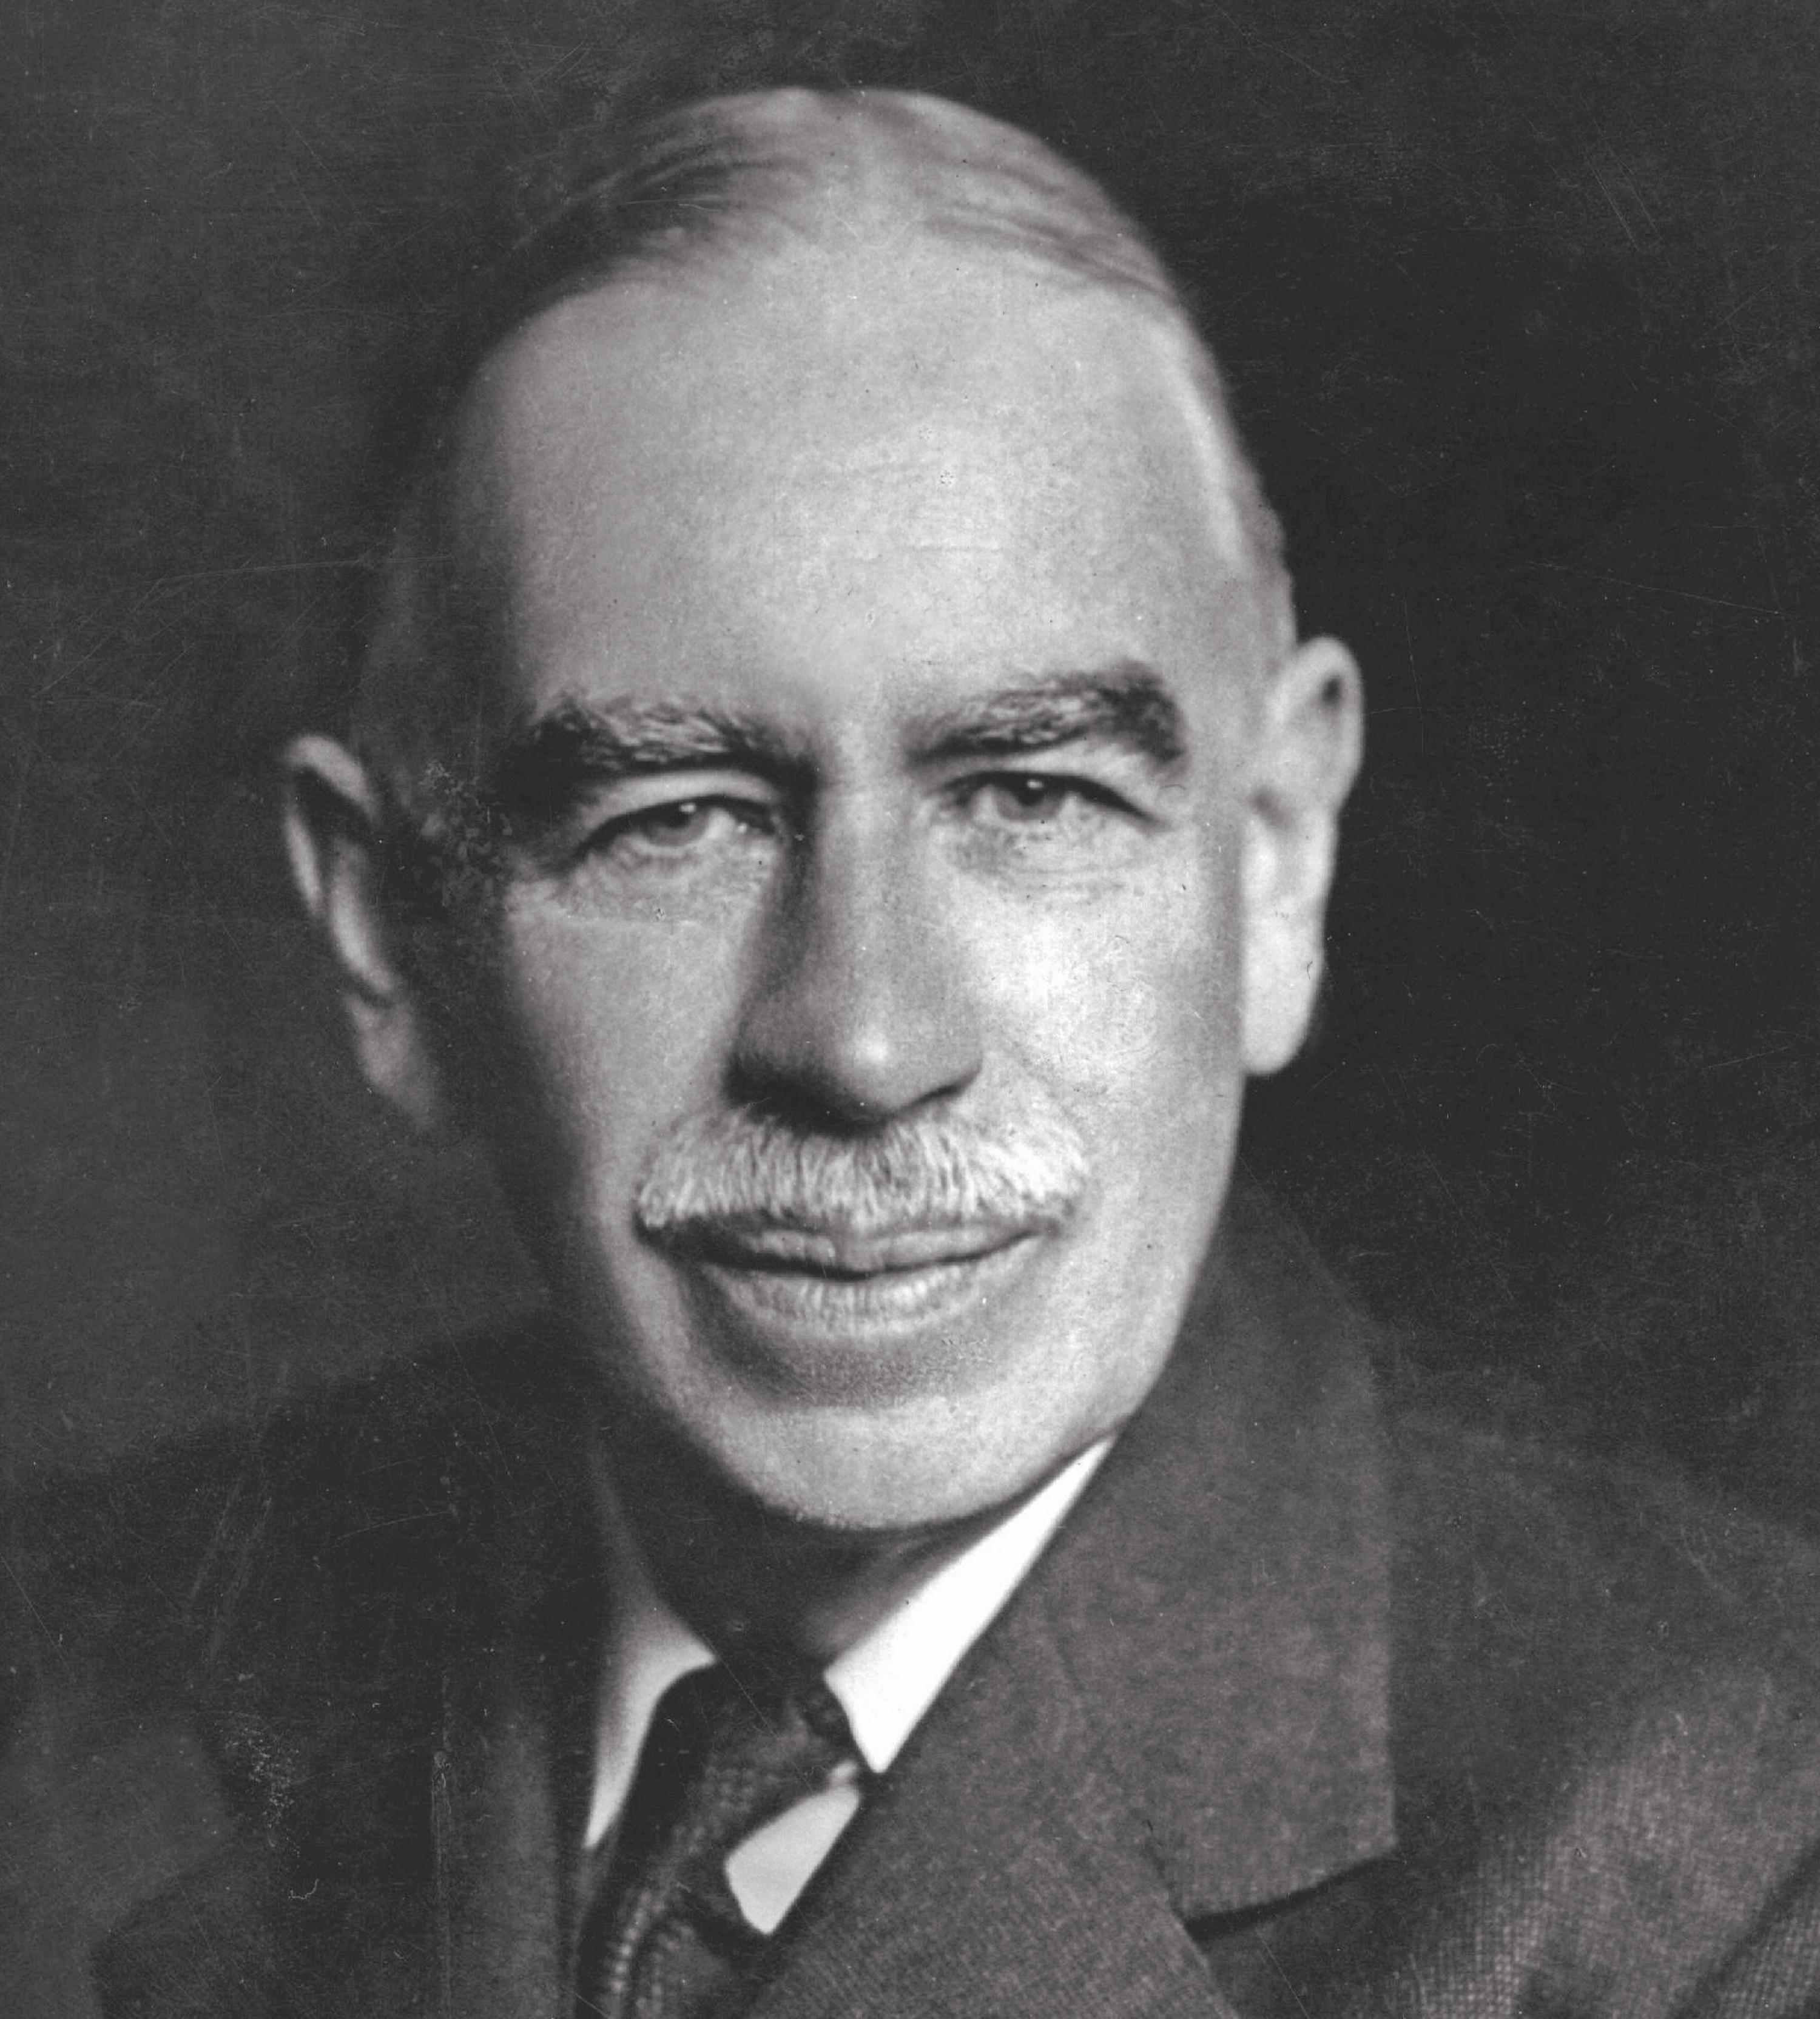 John Maynard Keynes, photo portrait